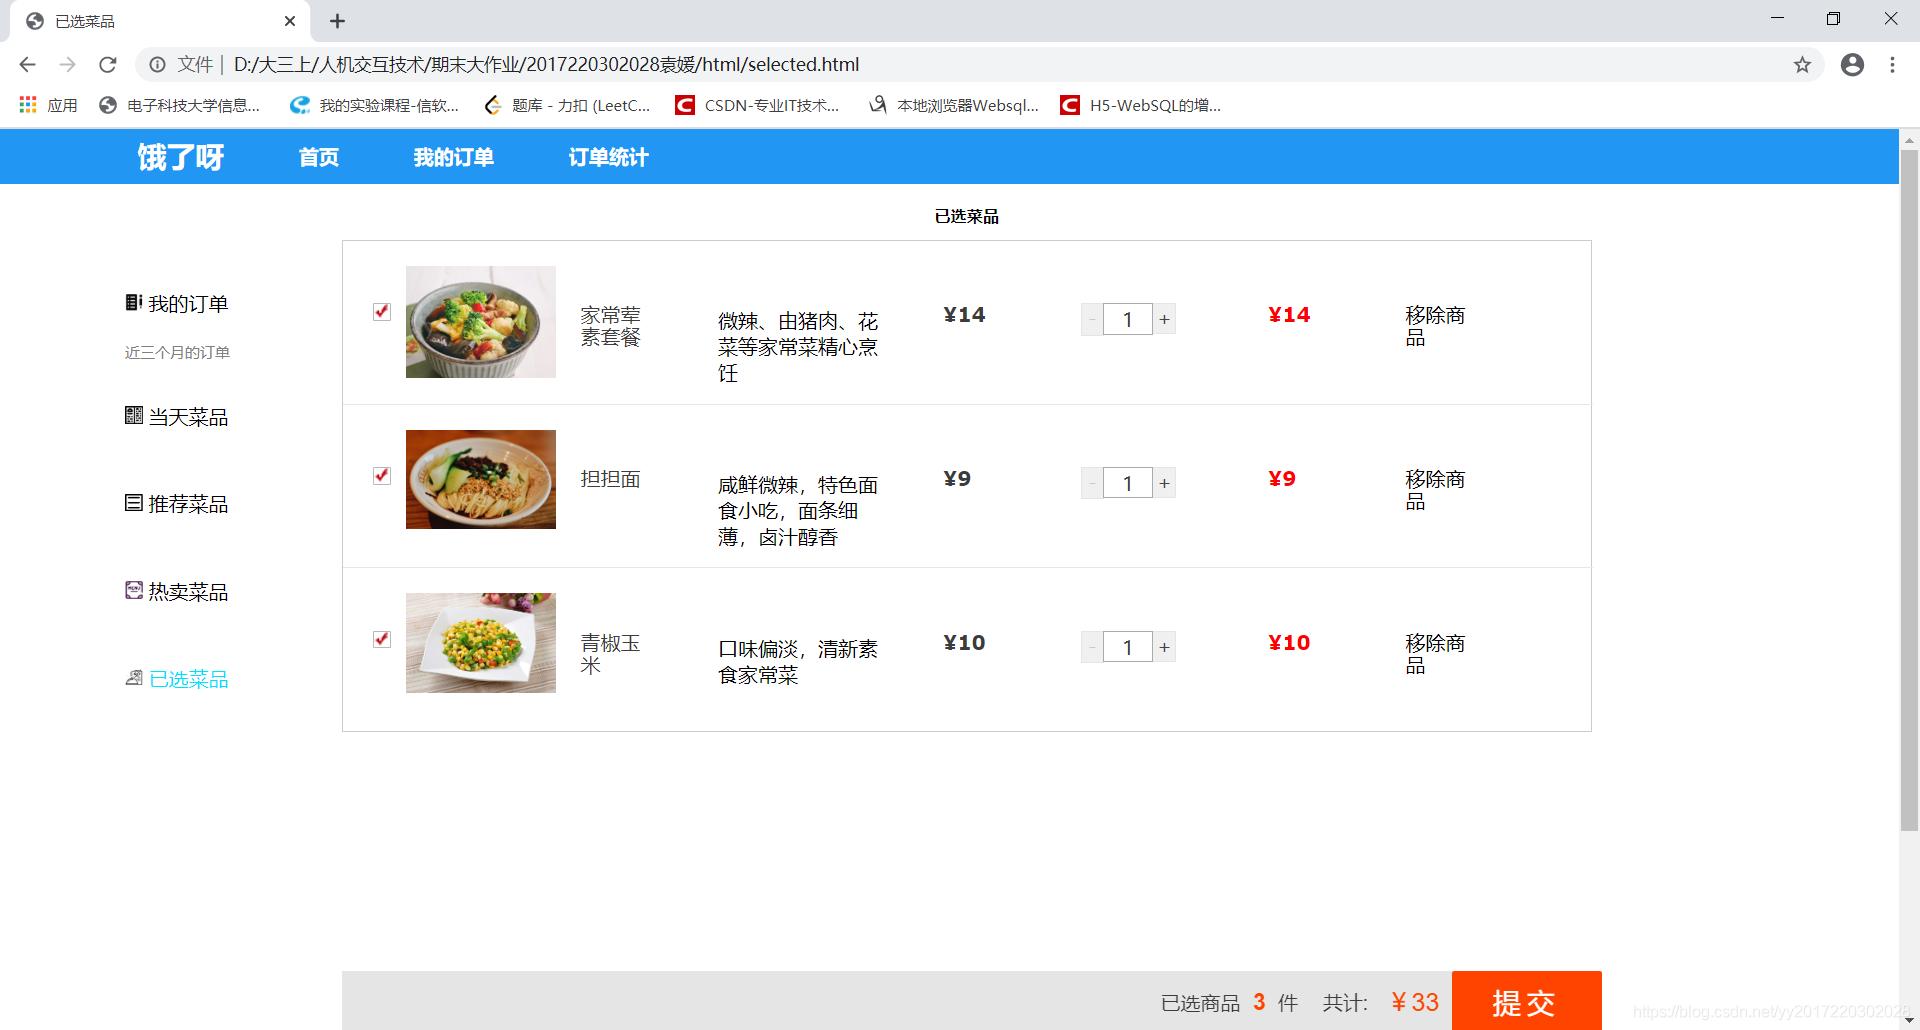 html5网站源码下载 定单(html5网站源码带后台) (https://www.oilcn.net.cn/) 综合教程 第4张